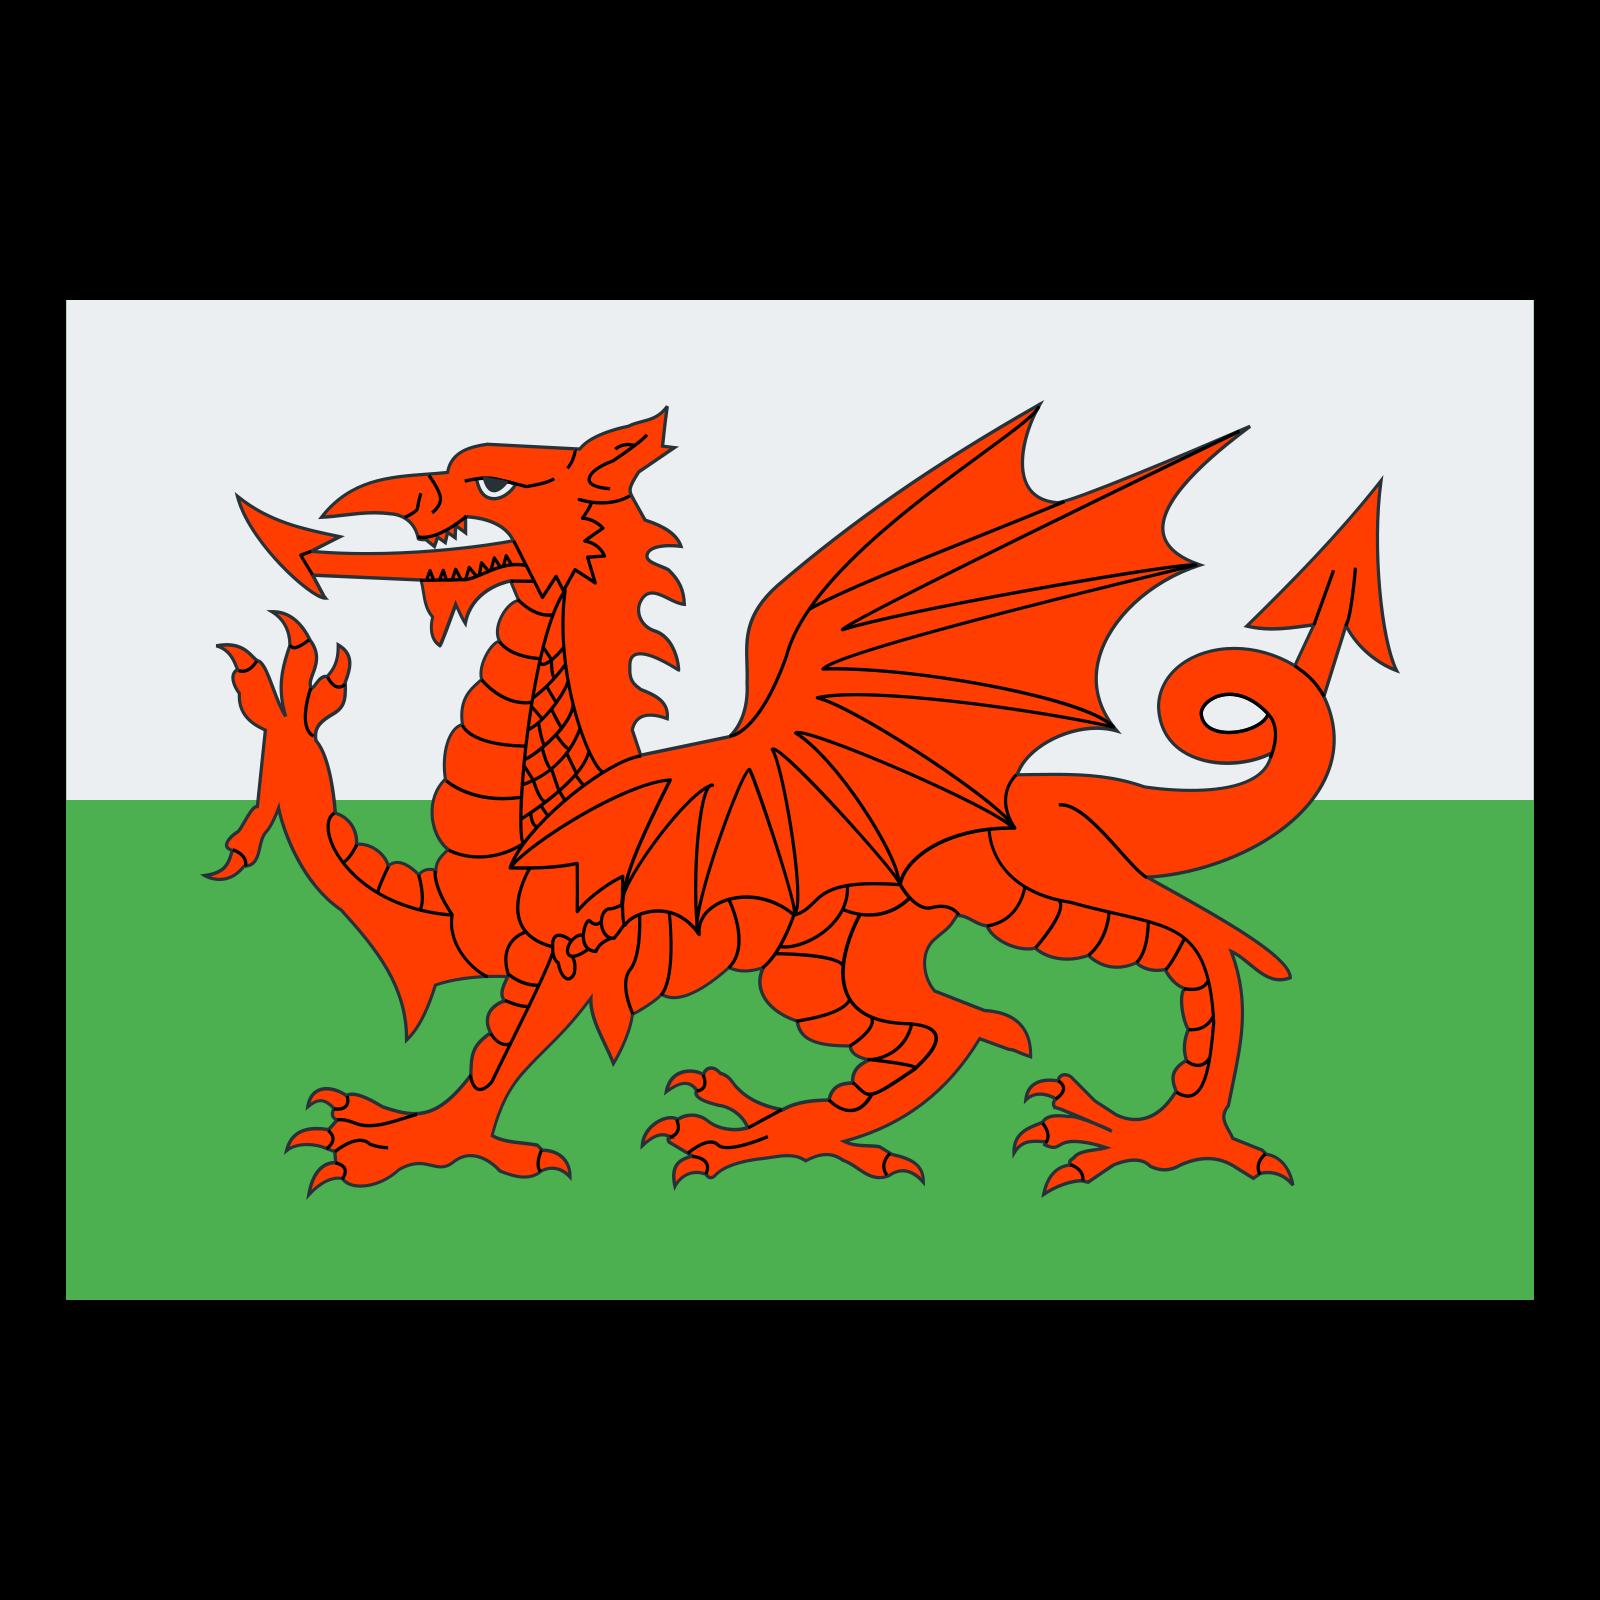 威尔士 icon